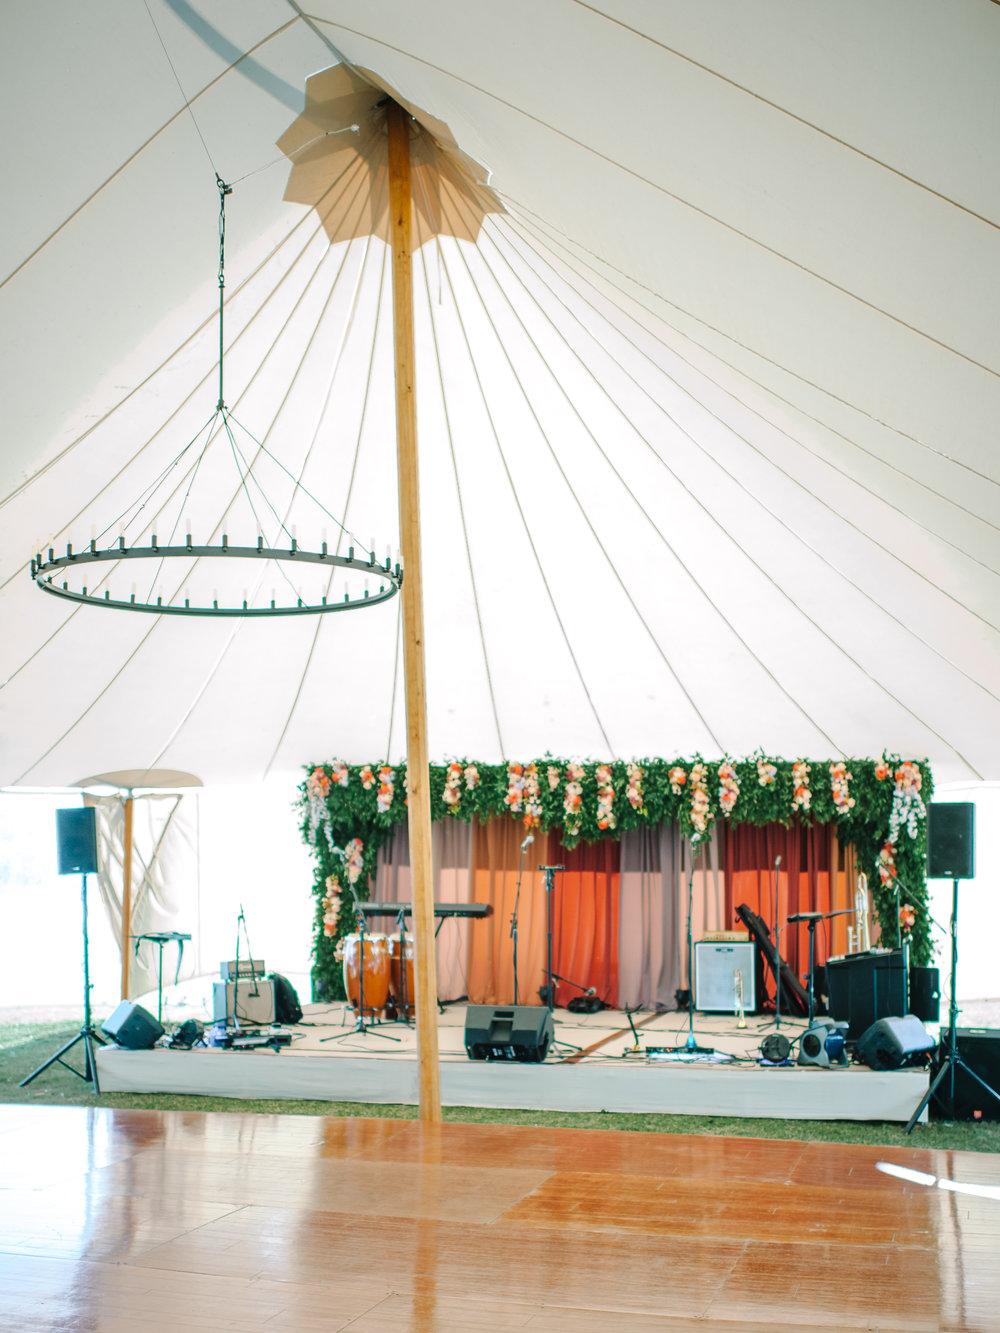 Plum wedding at Debordieu Club by Pasha Belman Photography